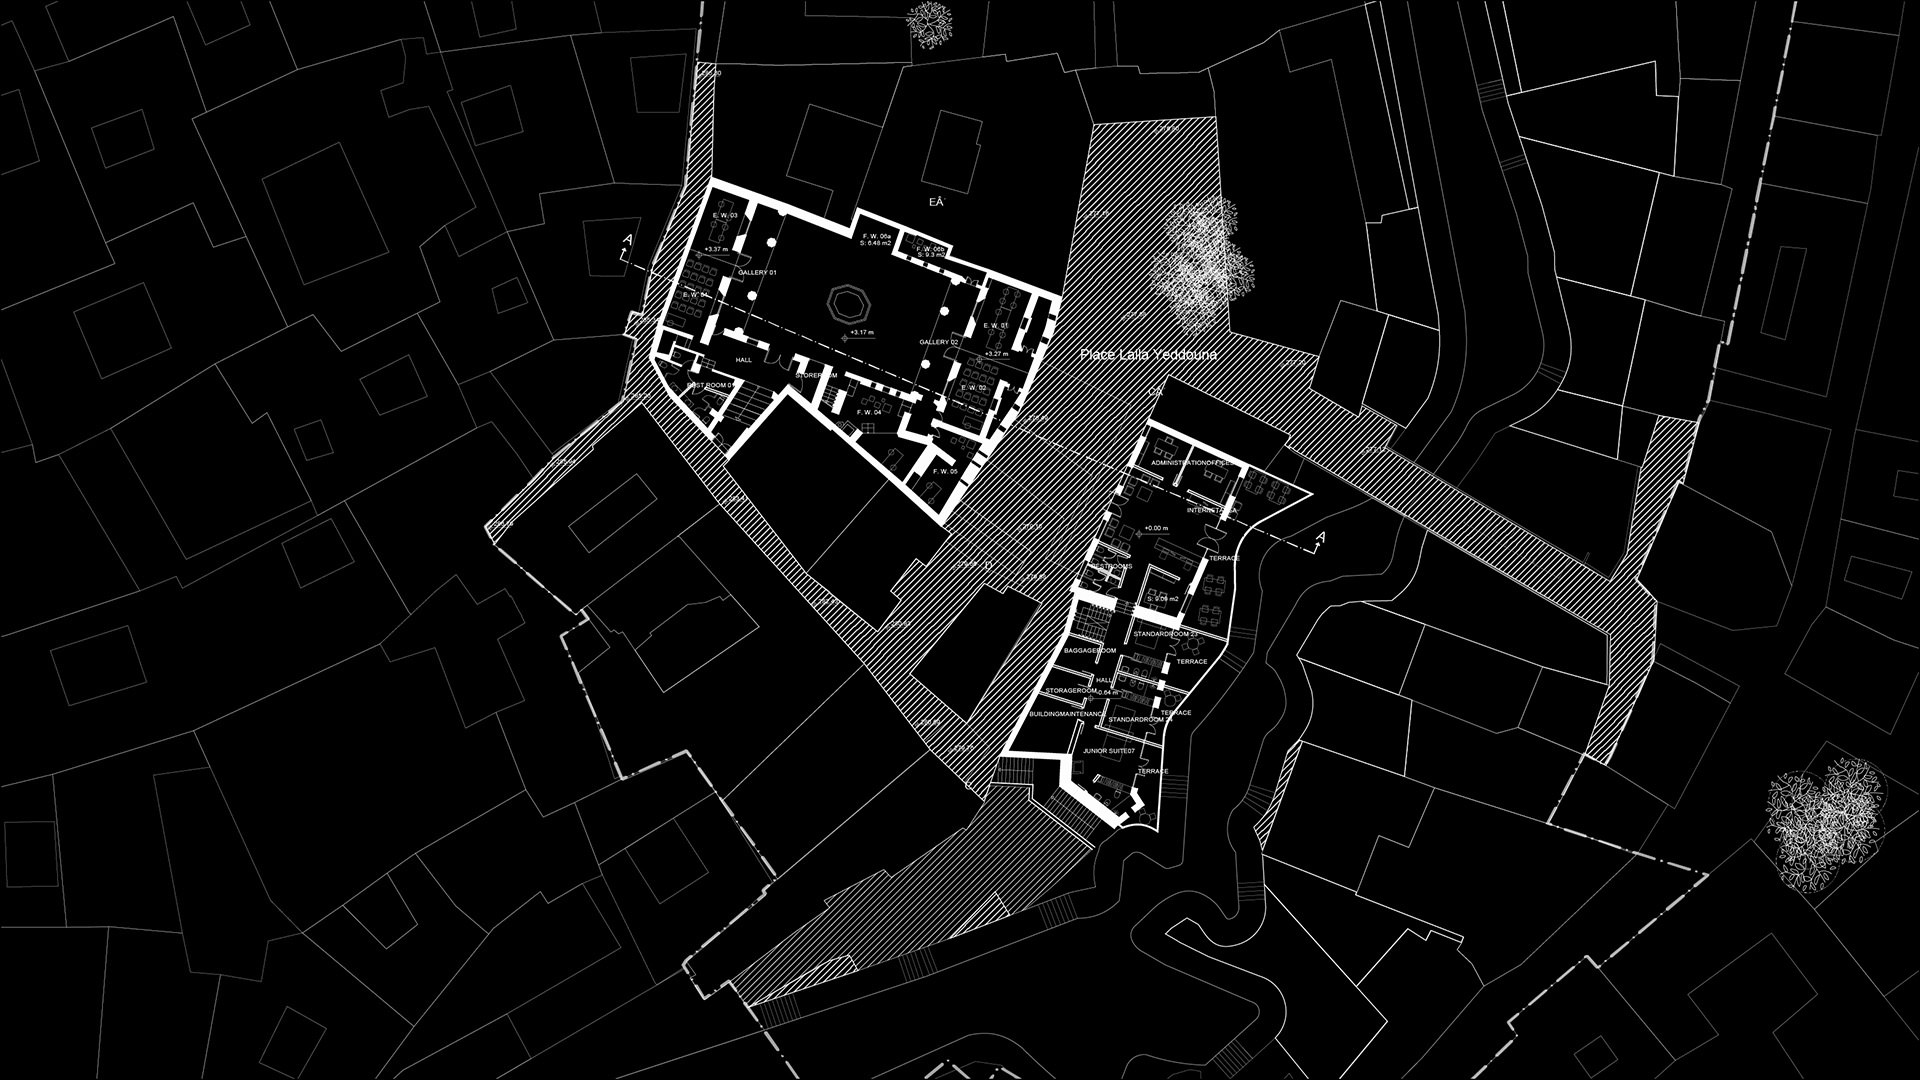 place-lalla-yeddouna-plan3-joerg-hugo.jpg